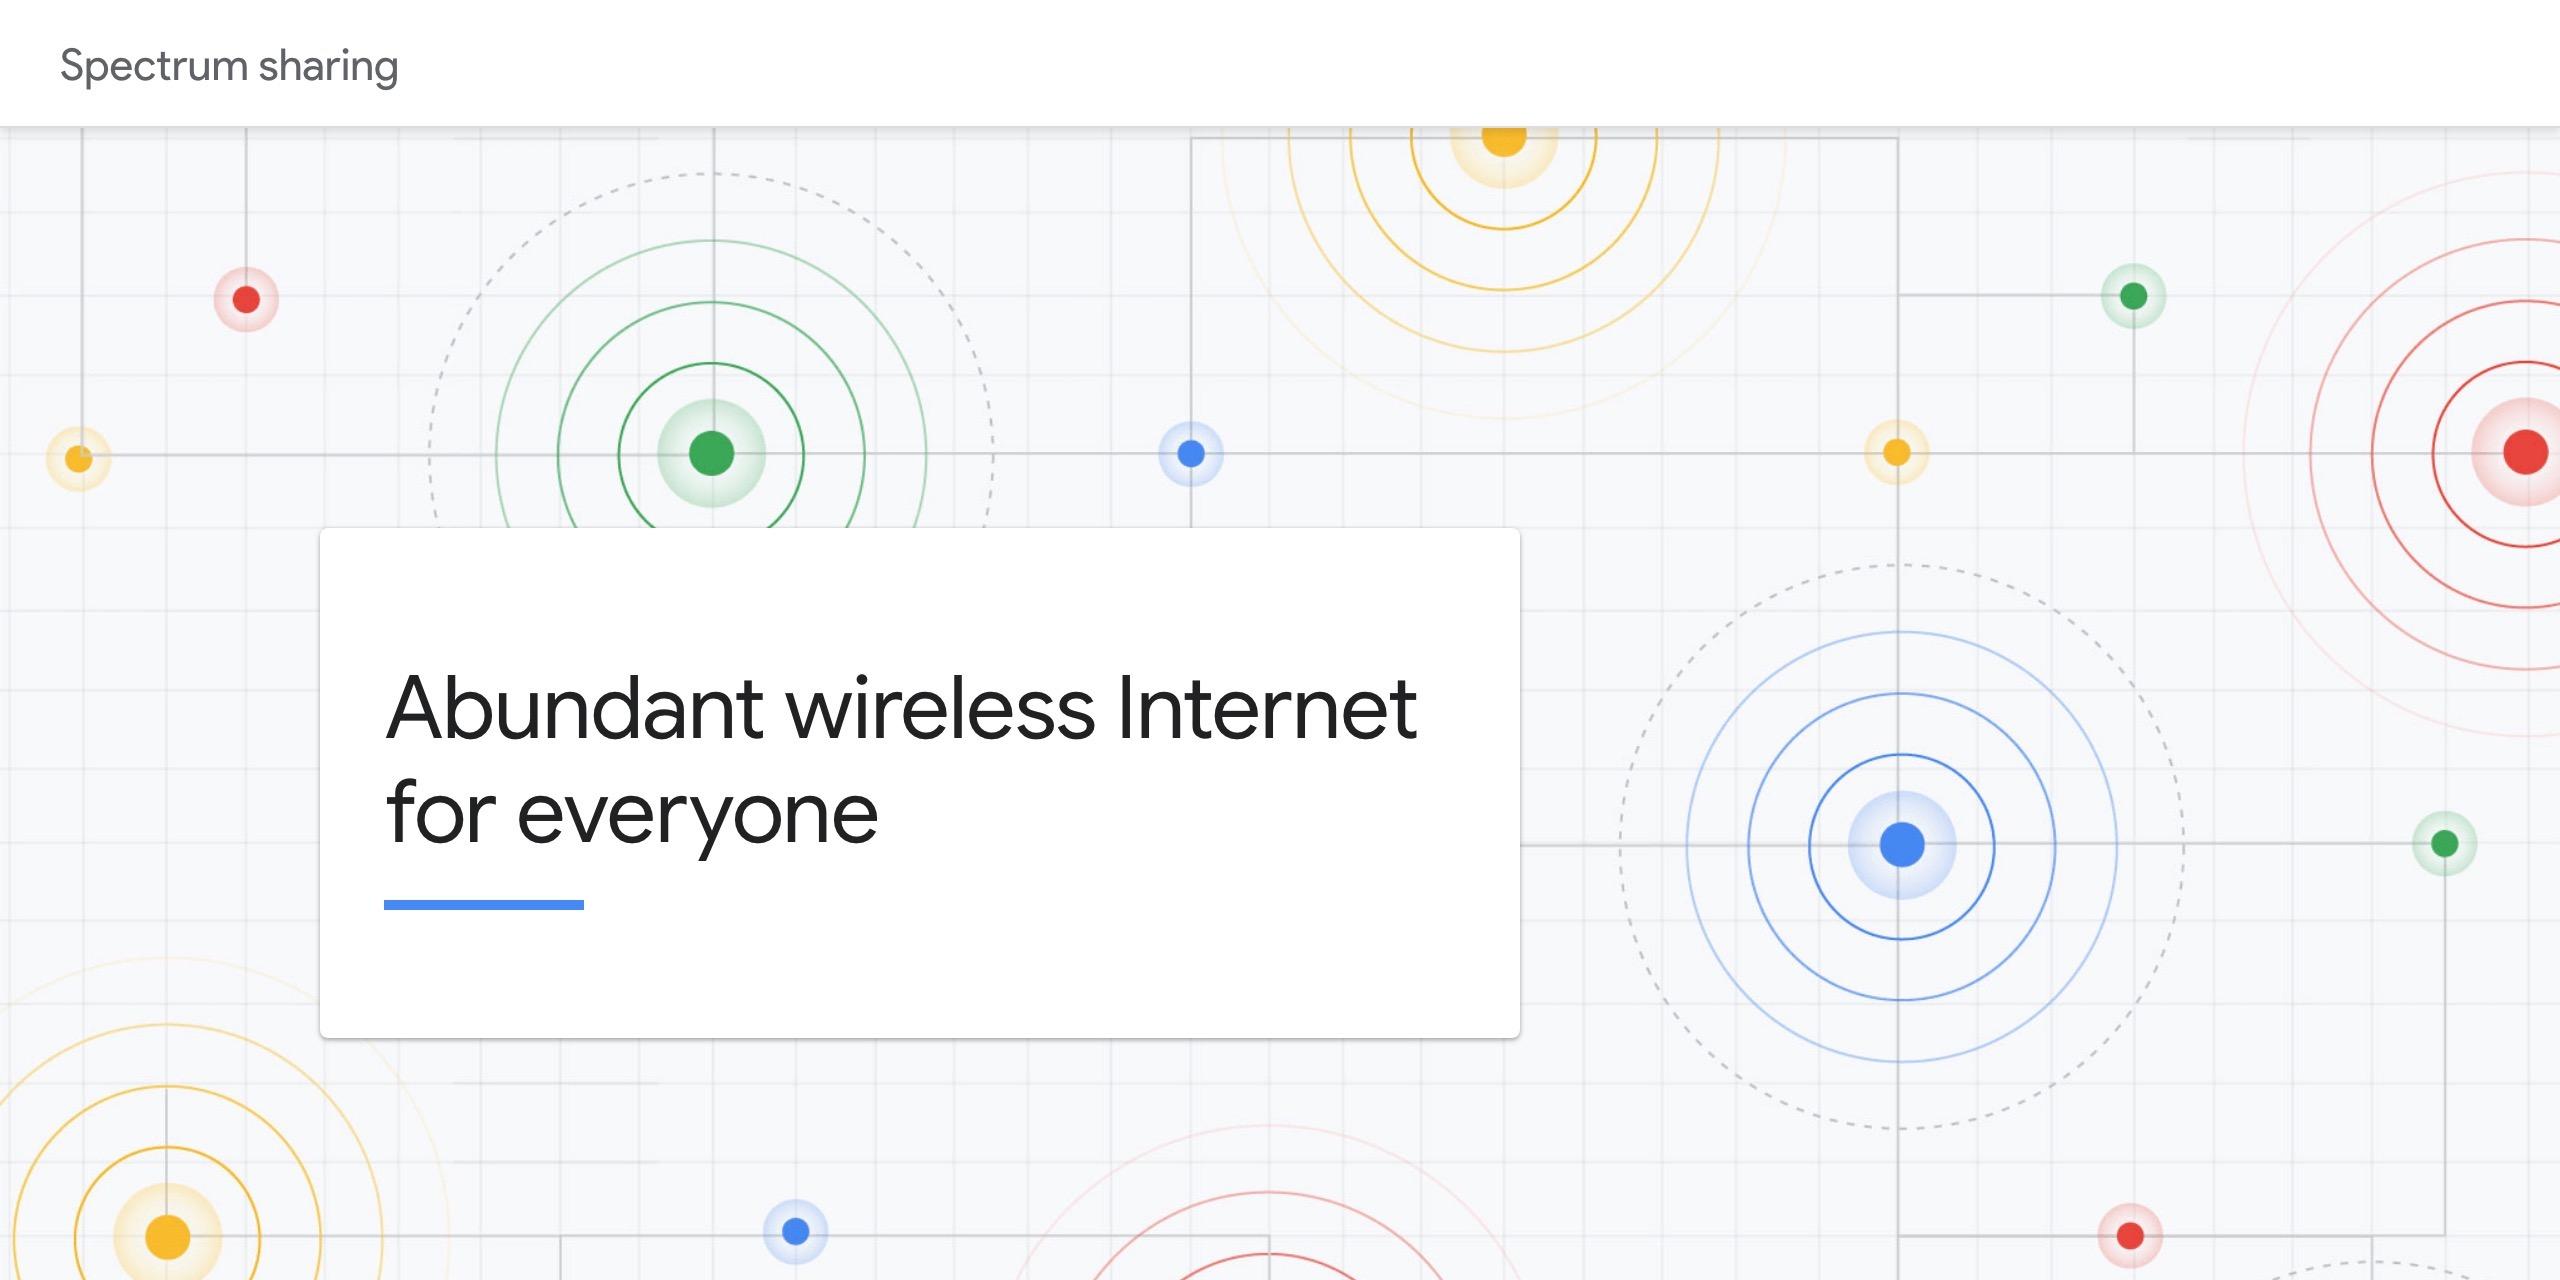 google details its interest in citizens broadband radio service cbrs spectrum sharing